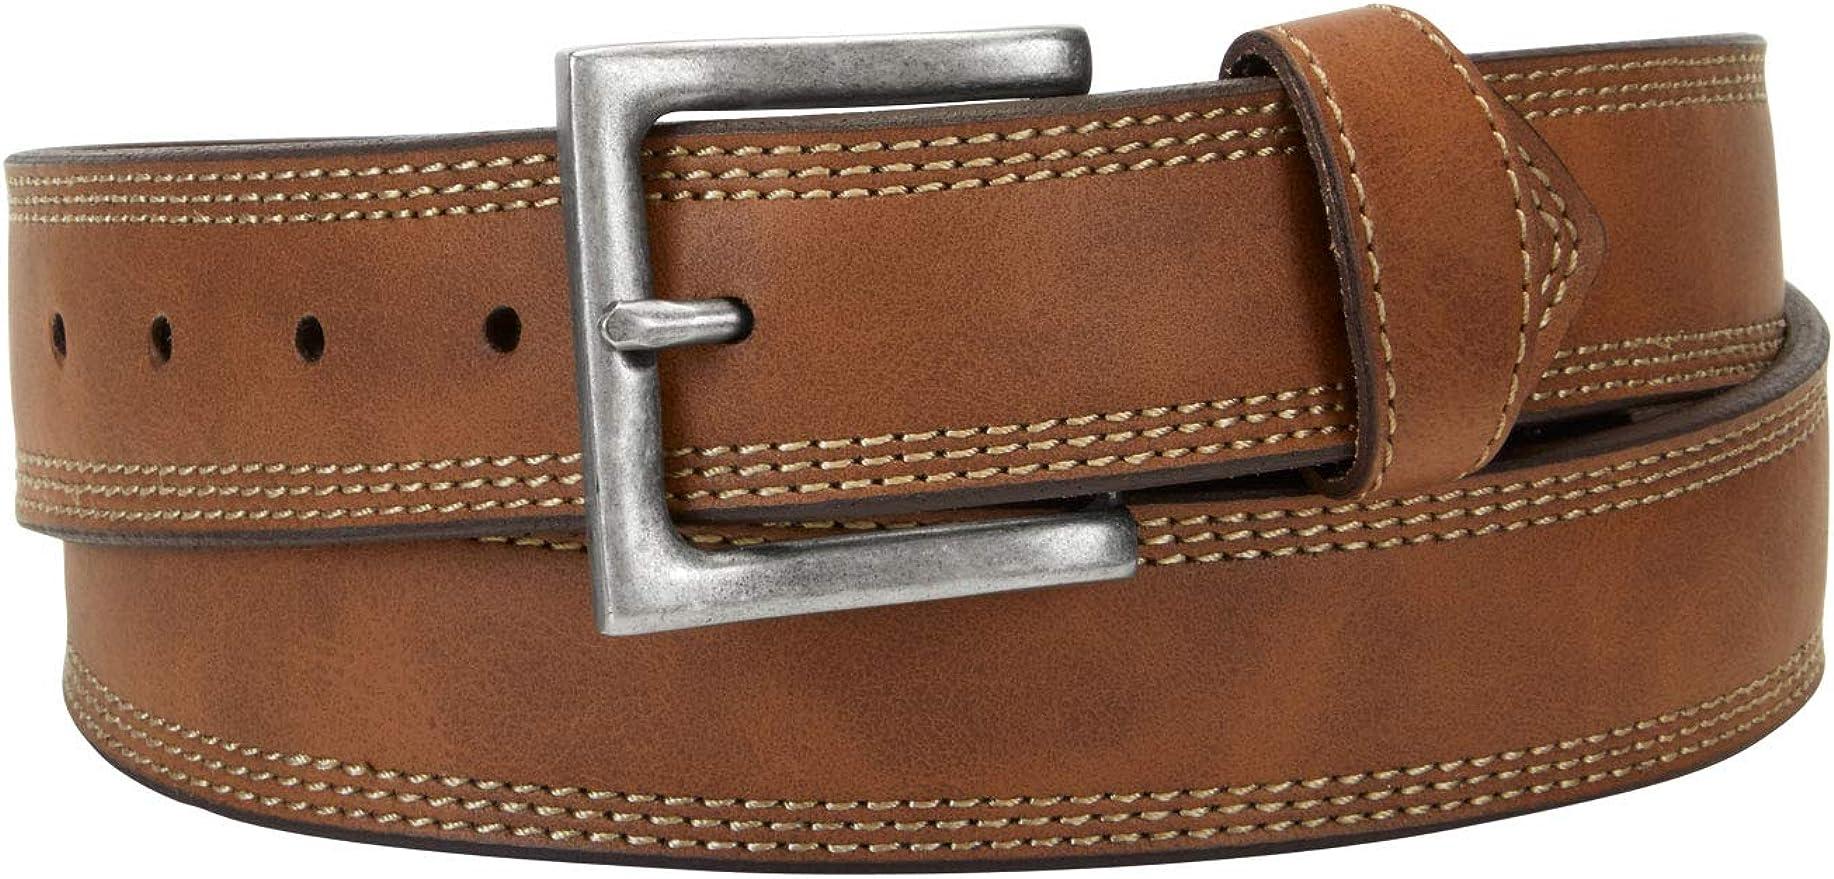 Wrangler Mens Rugged Wear Belt